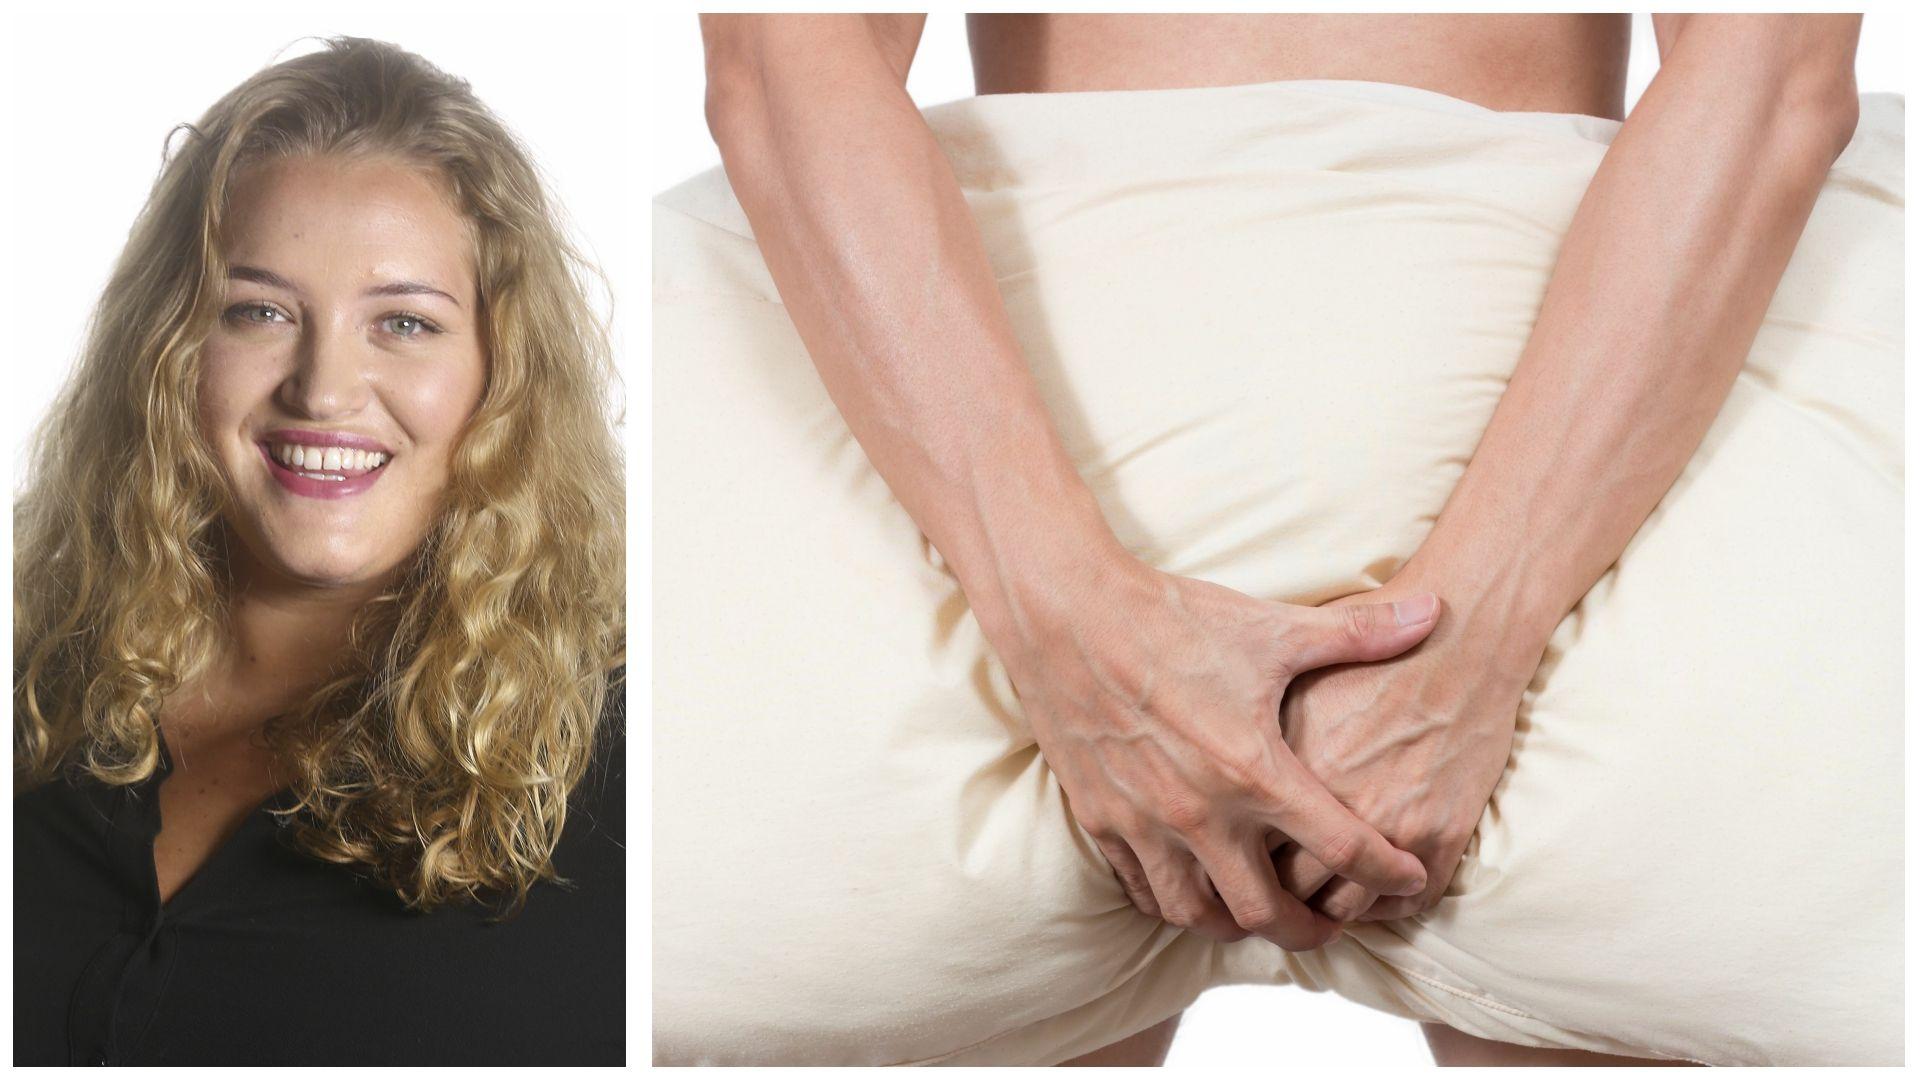 kjønn massags Sasha grå blowjob pics